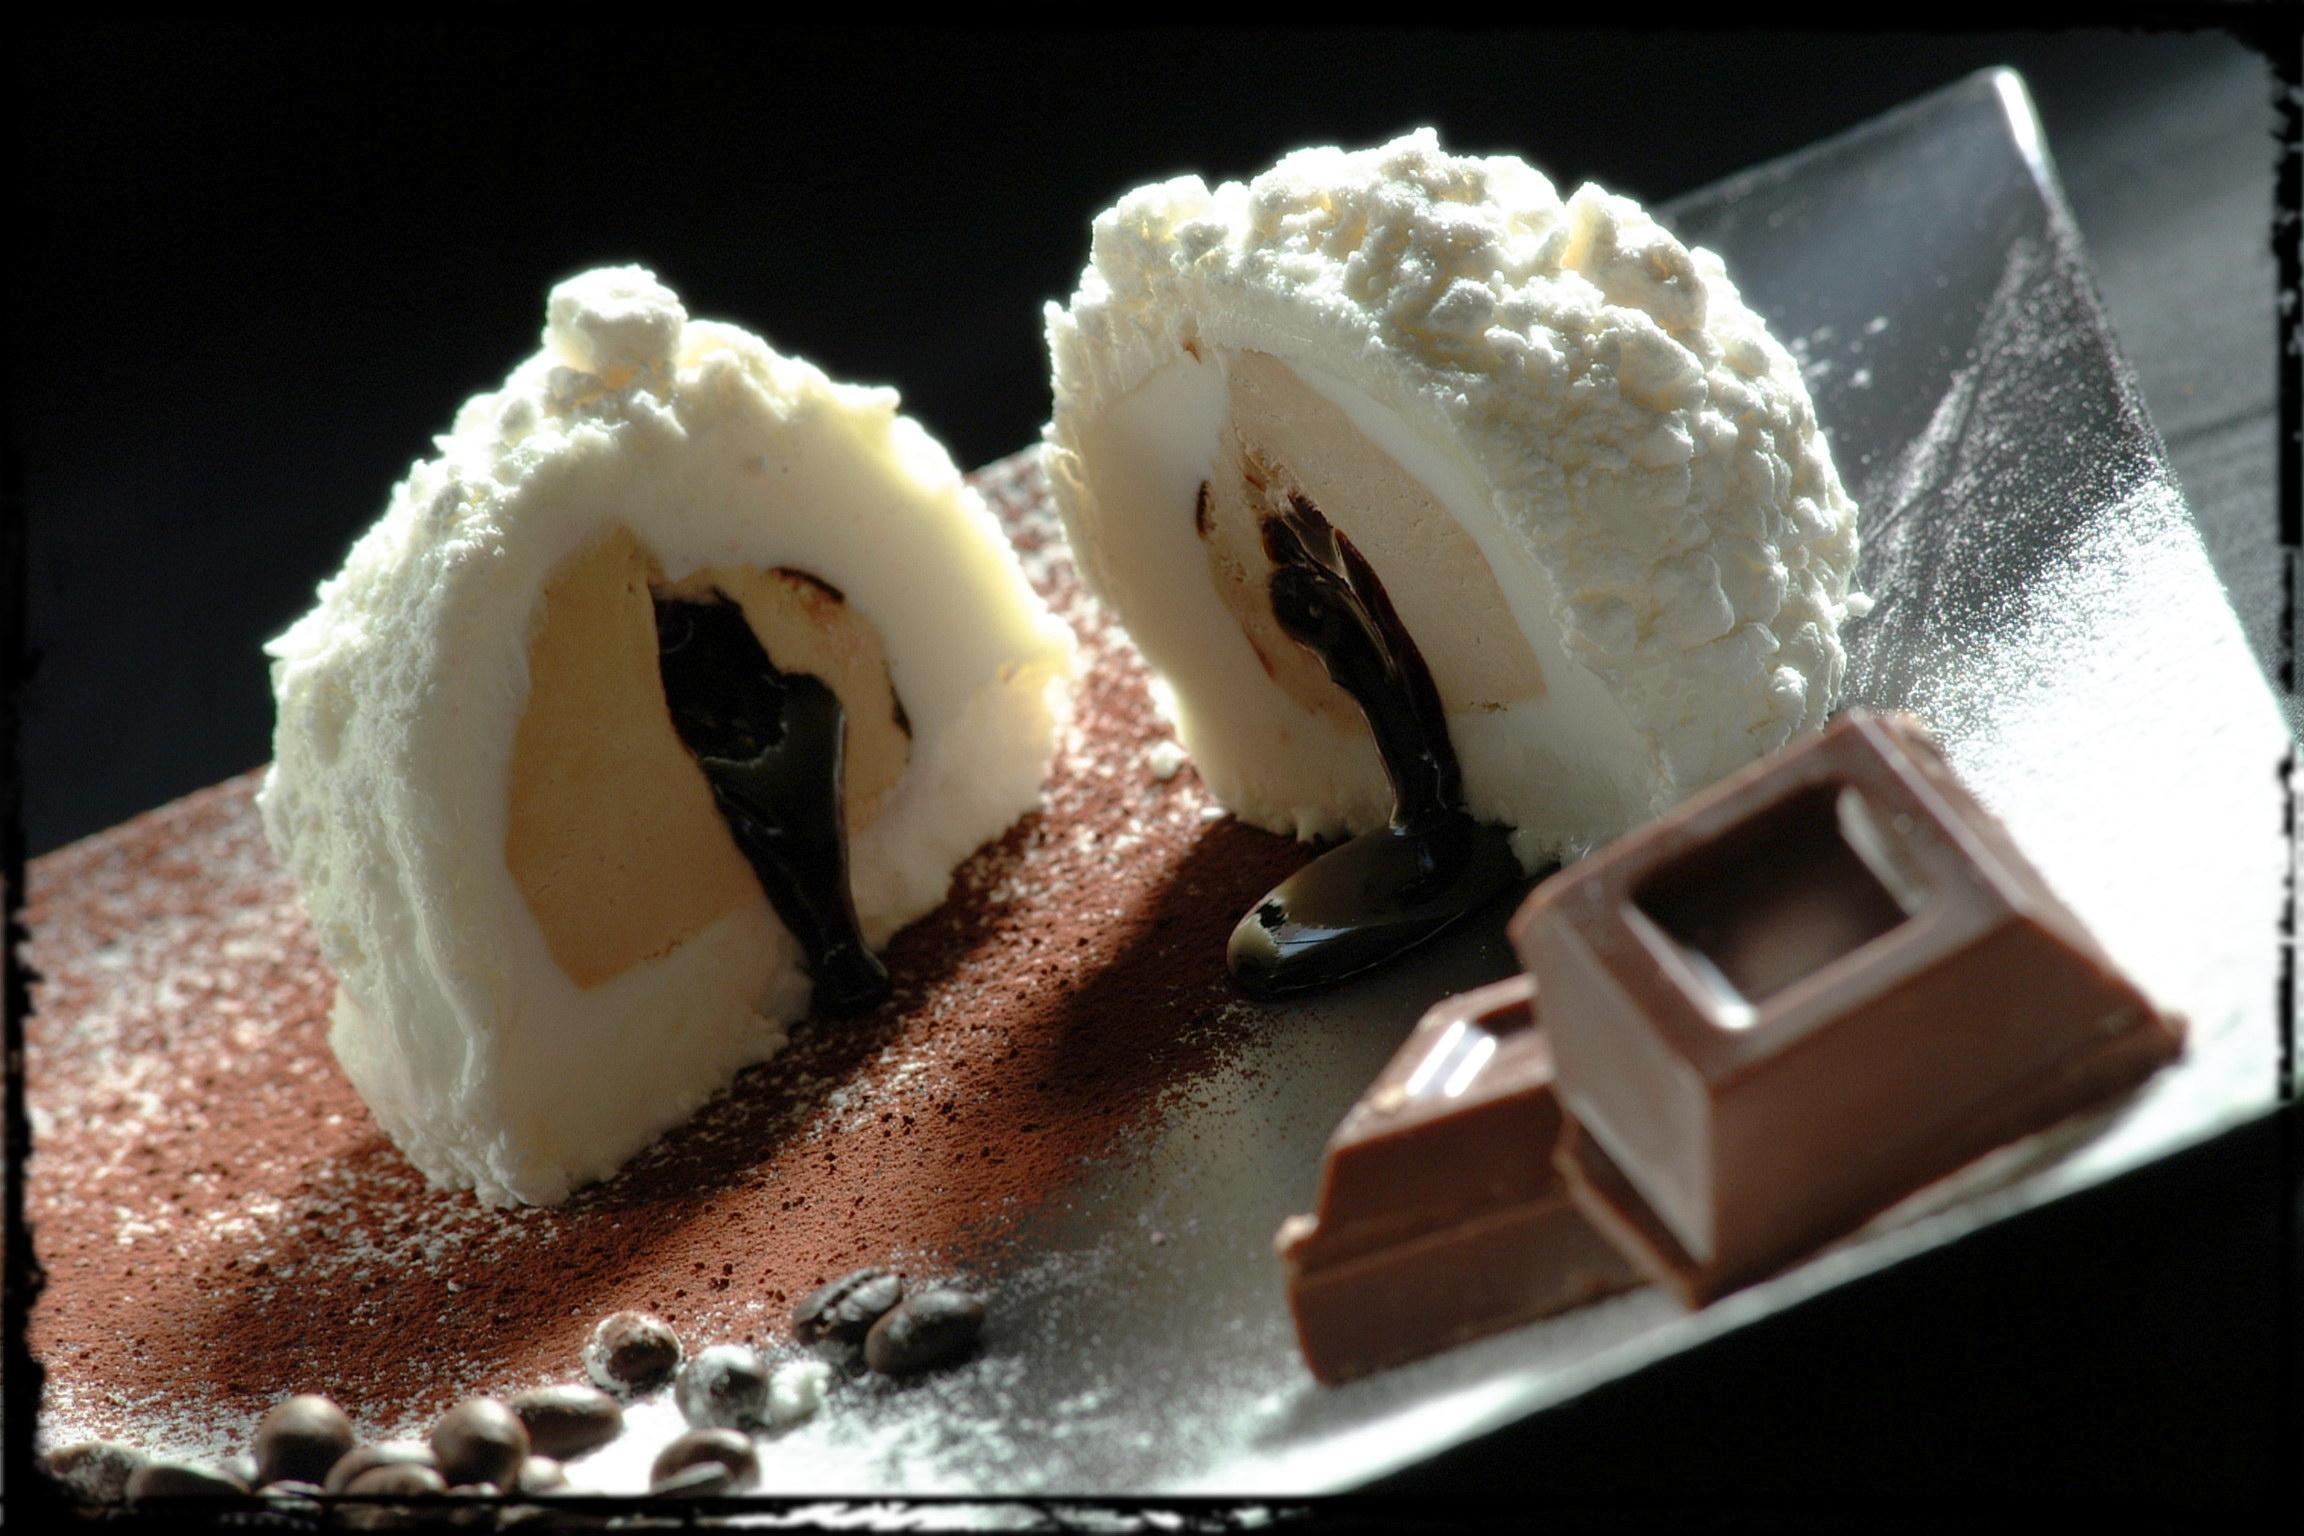 tartufo meringato al cioccolato e caffè...